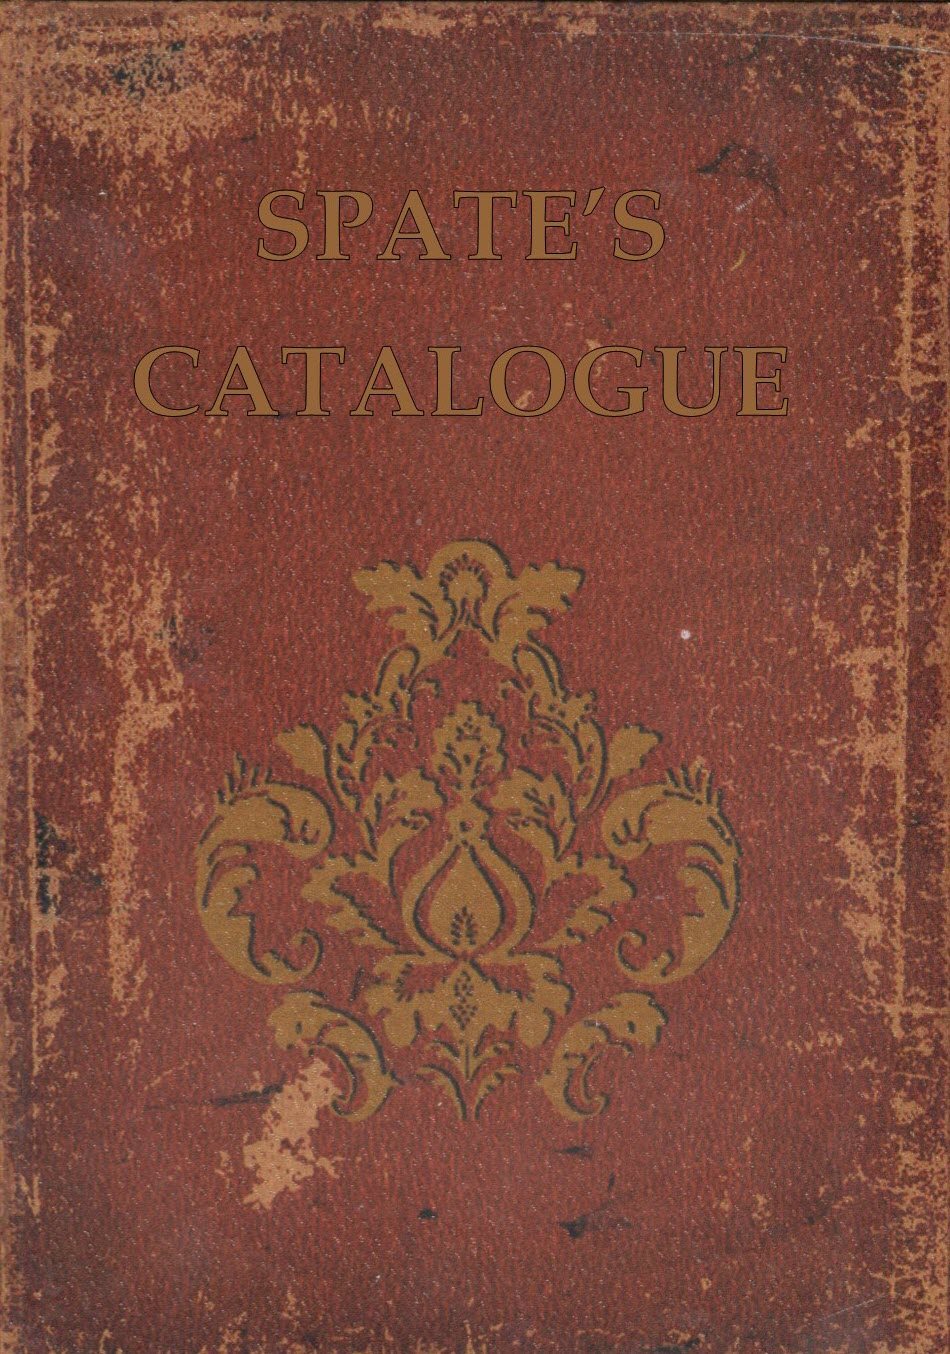 The Spates Catalogue